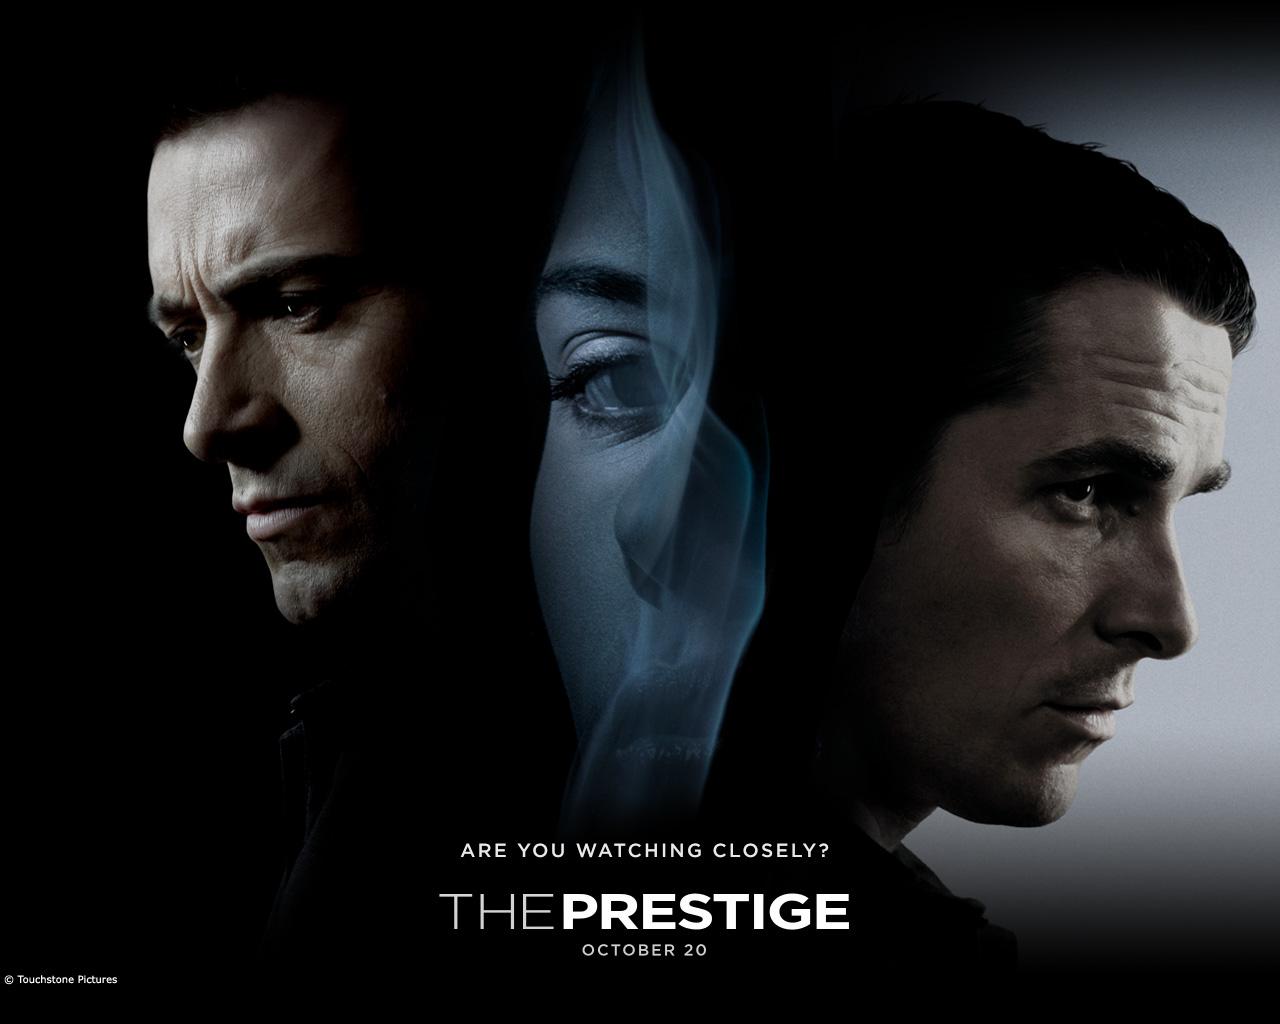 http://1.bp.blogspot.com/_khuNxDZIqyM/THeGvvhwPUI/AAAAAAAAAYE/tuDZbGoPyV8/s1600/The+Prestige+(2006)+DVDrip.jpg